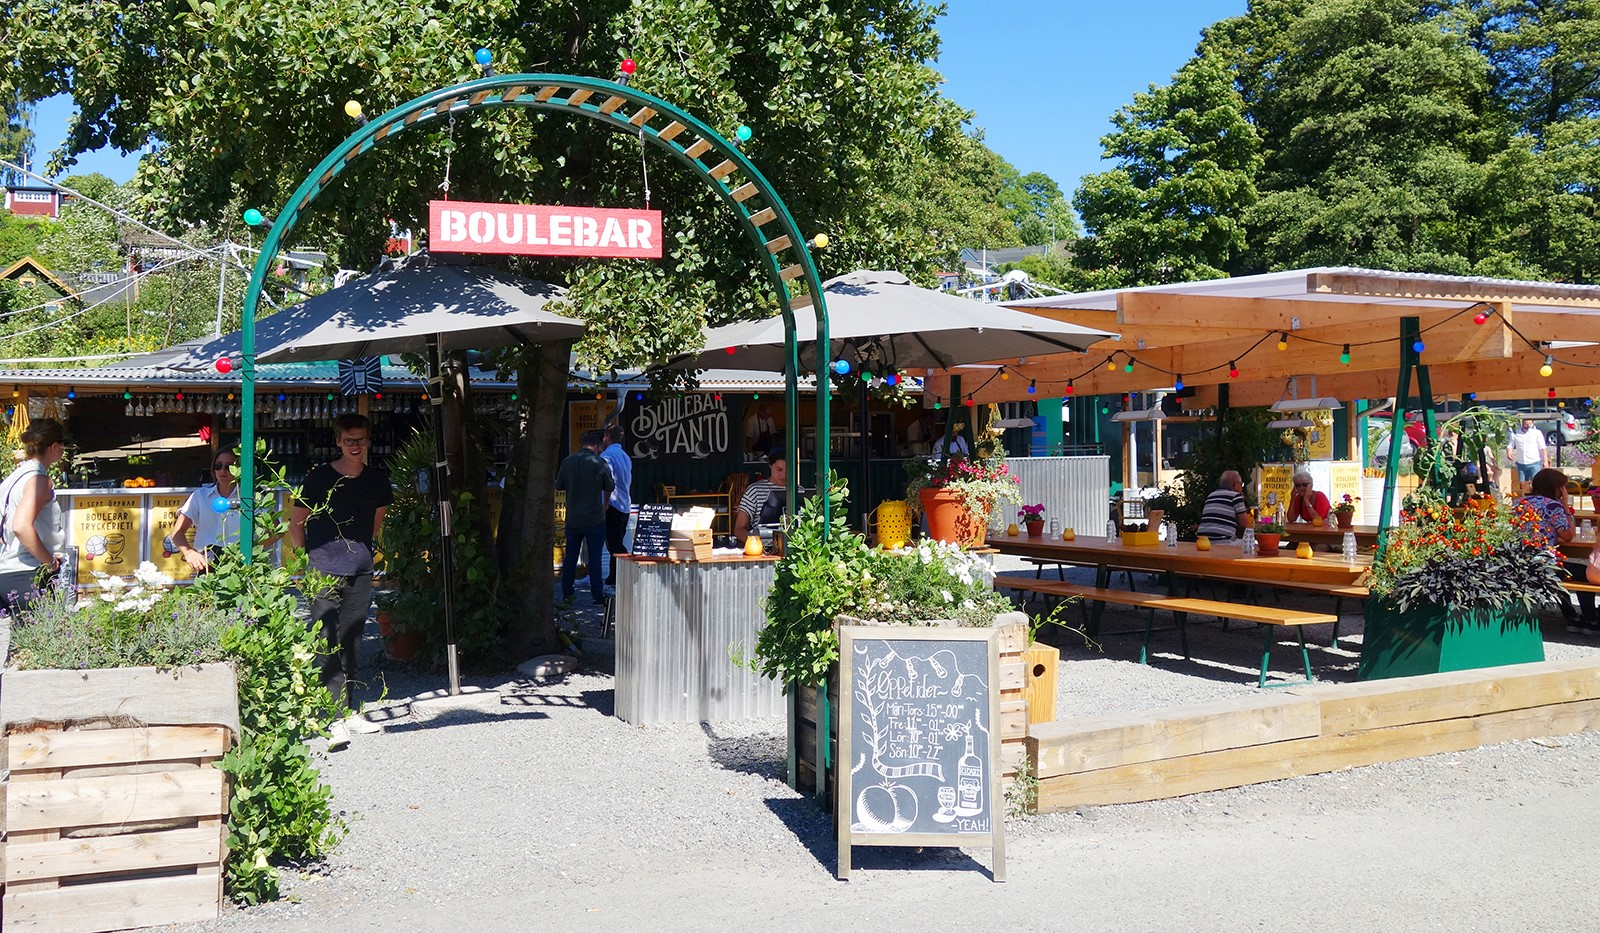 Heleneborgsgatan 38, 6 tr - Boulebar